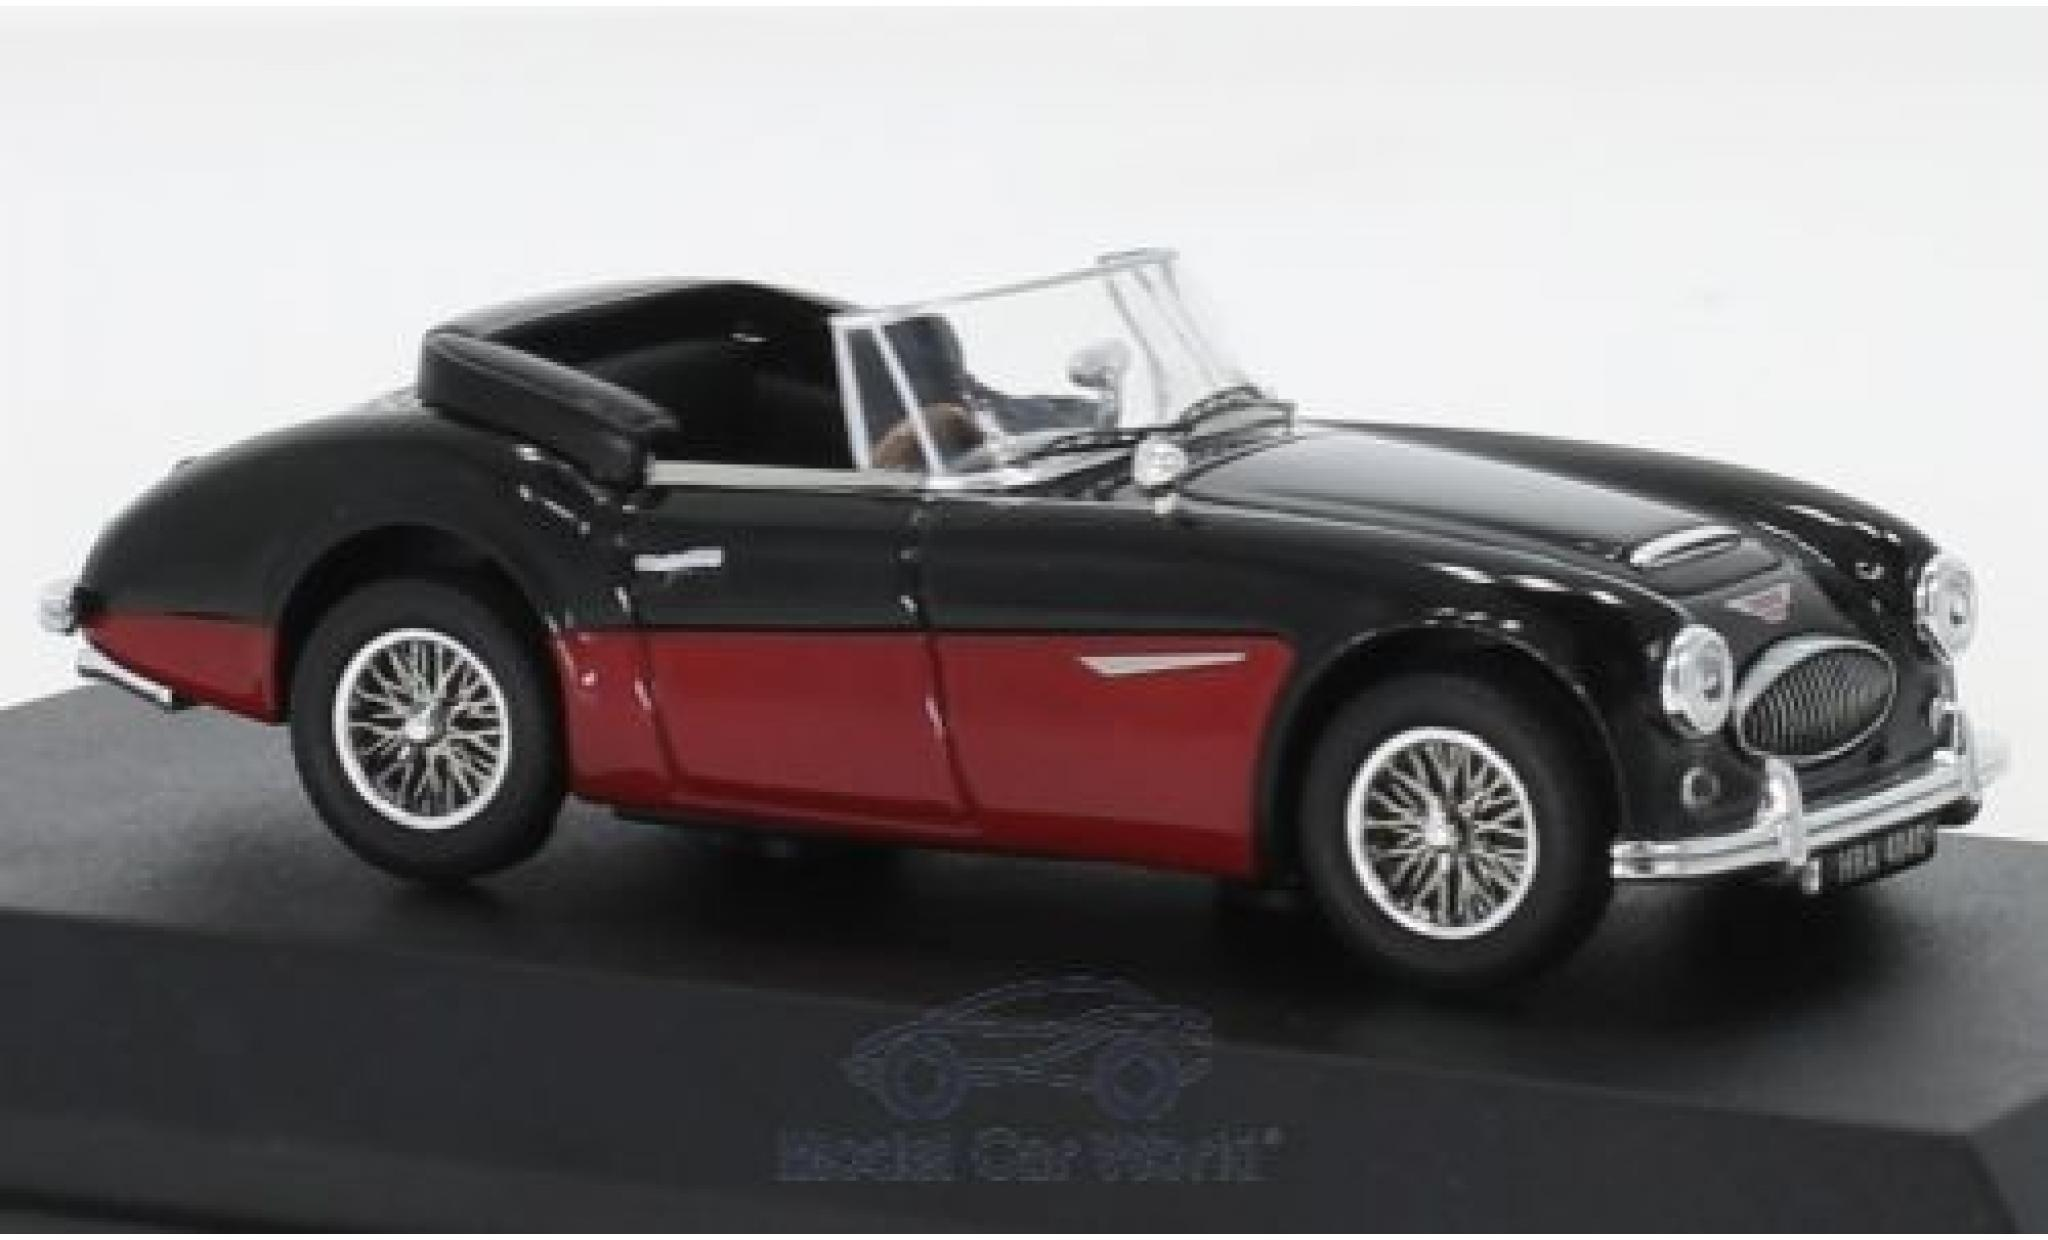 Austin Healey 3000 1/43 Norev MK3 noire/rouge RHD 1964